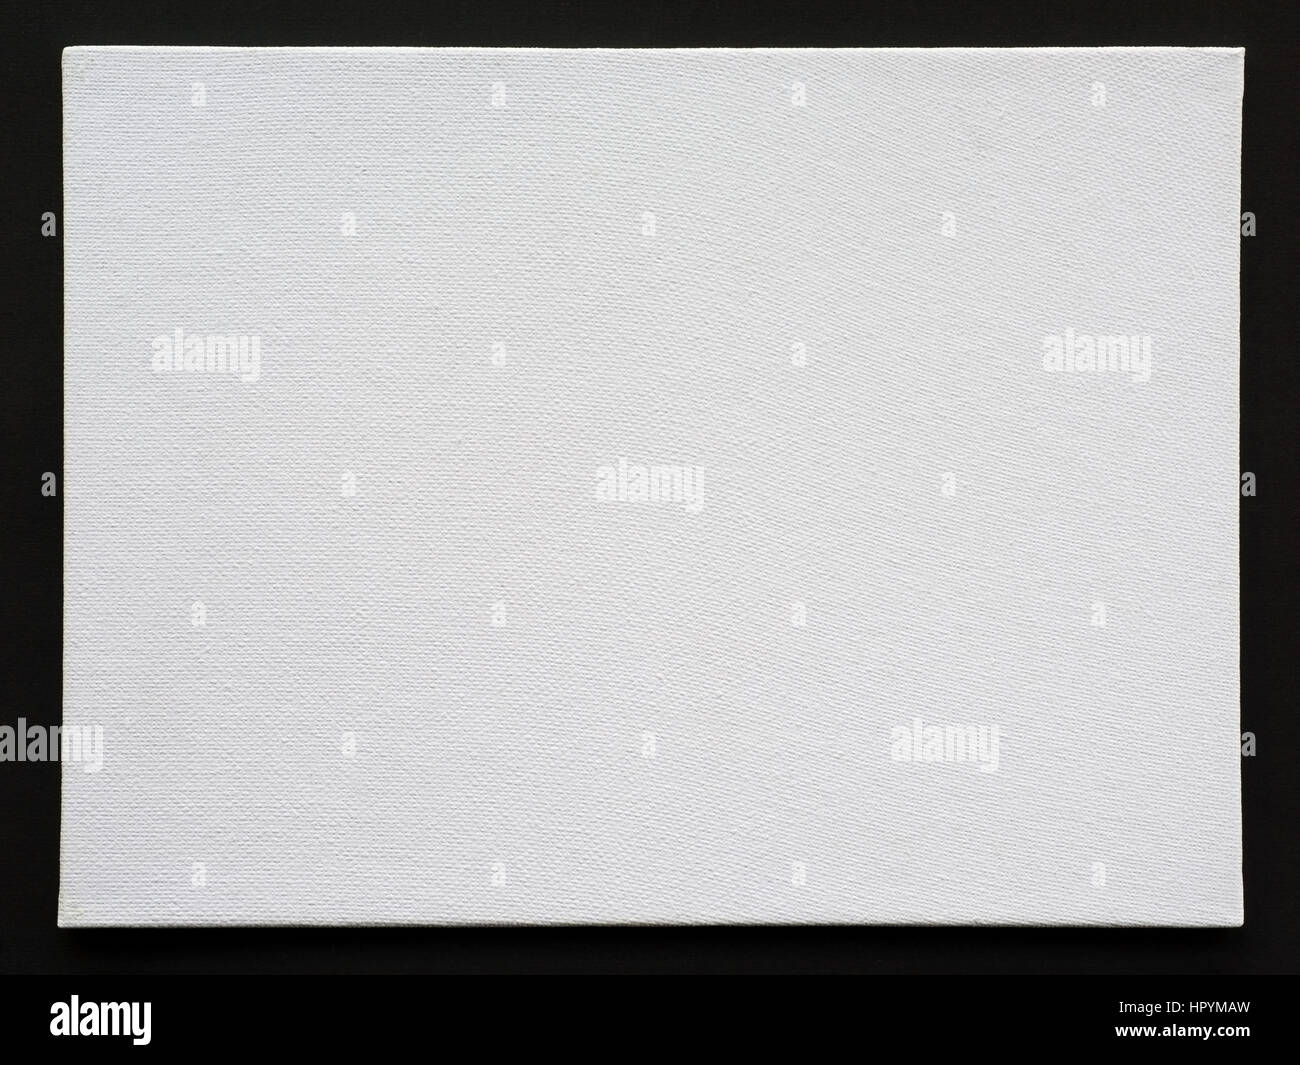 Blank Canvas Frame Stock Photos & Blank Canvas Frame Stock Images ...